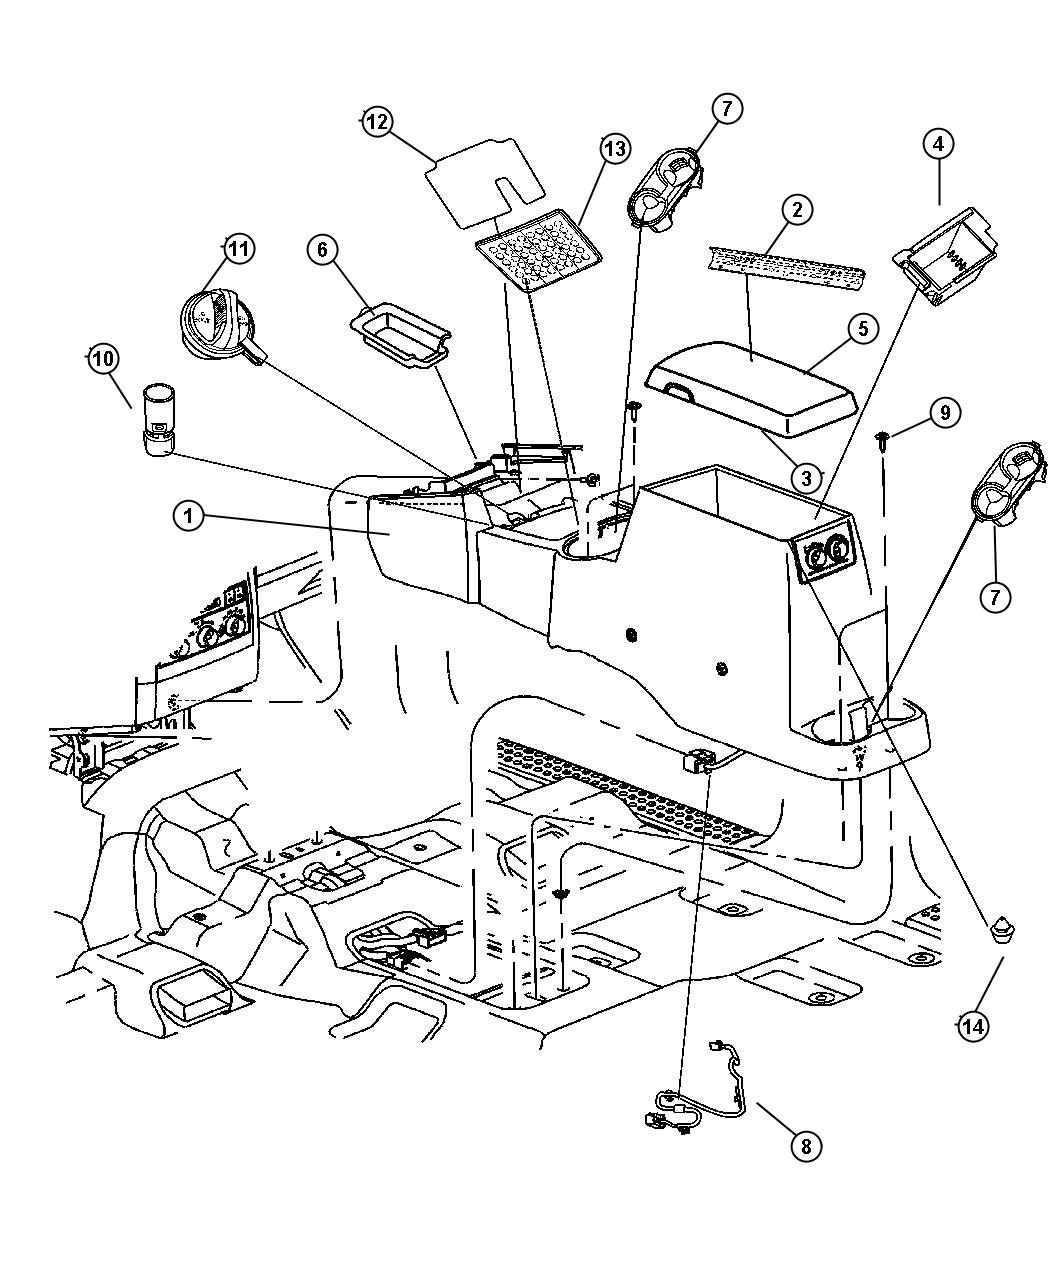 Dodge Durango Wiring. Console. Trim: [all trim codes